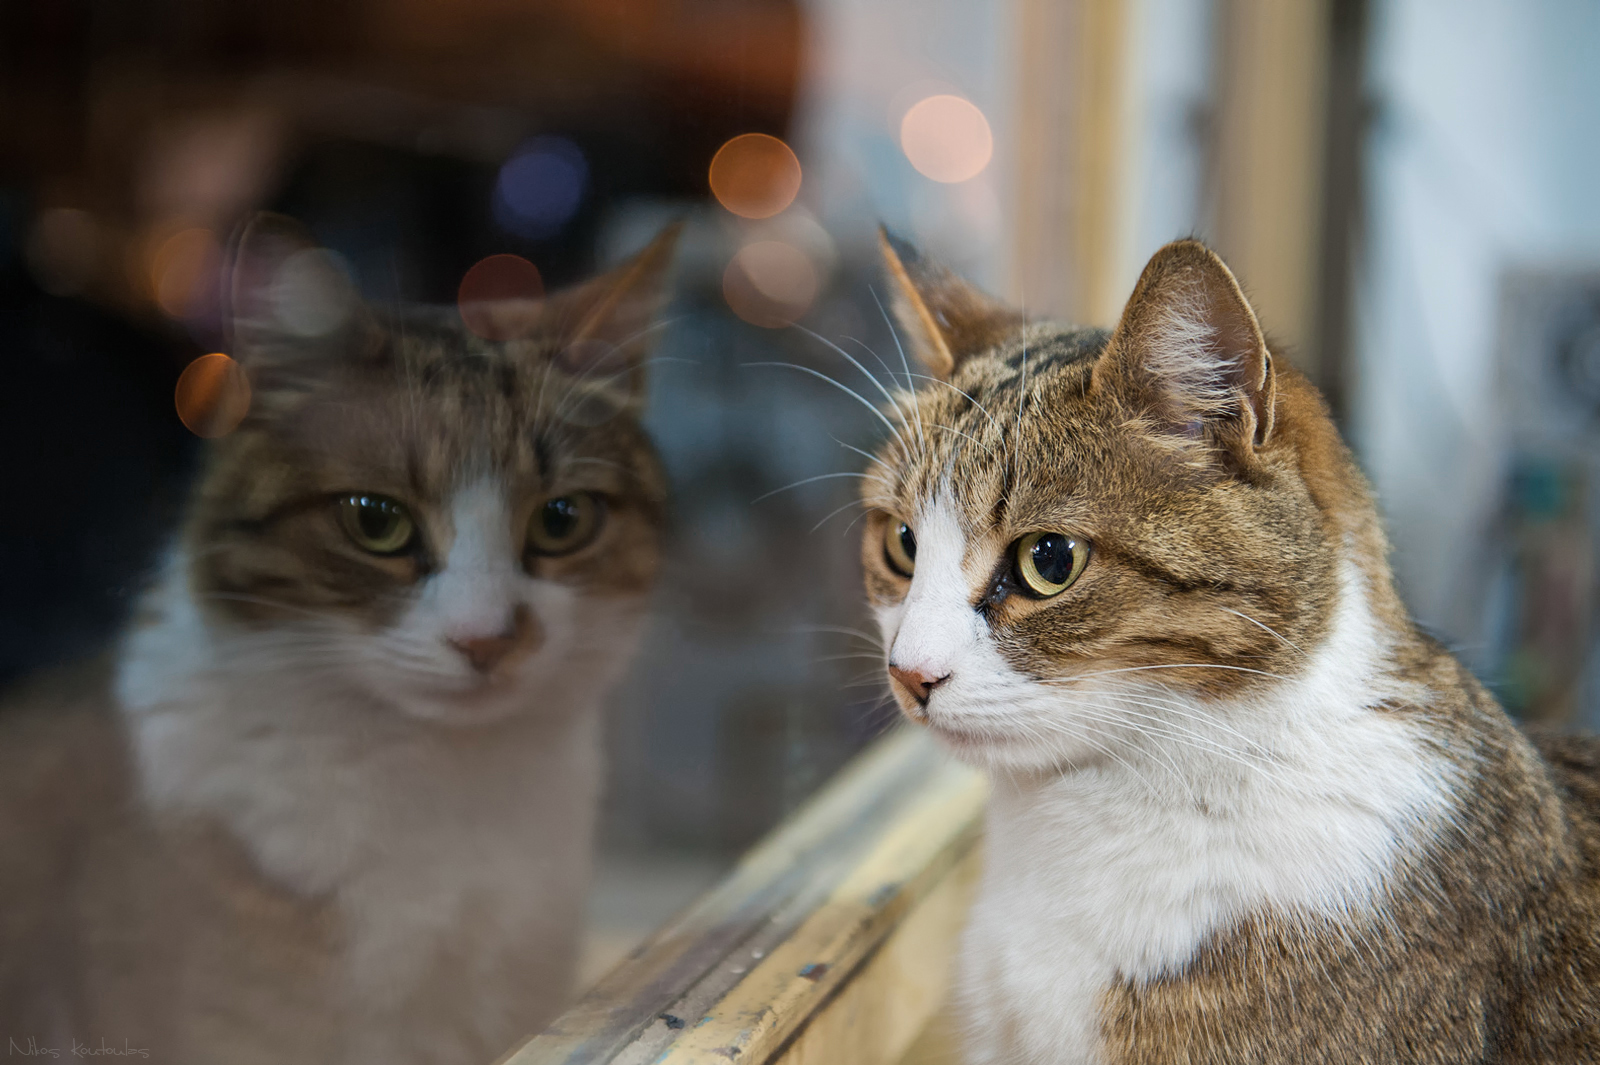 Un parásito de los gatos afecta al aprendizaje infantil